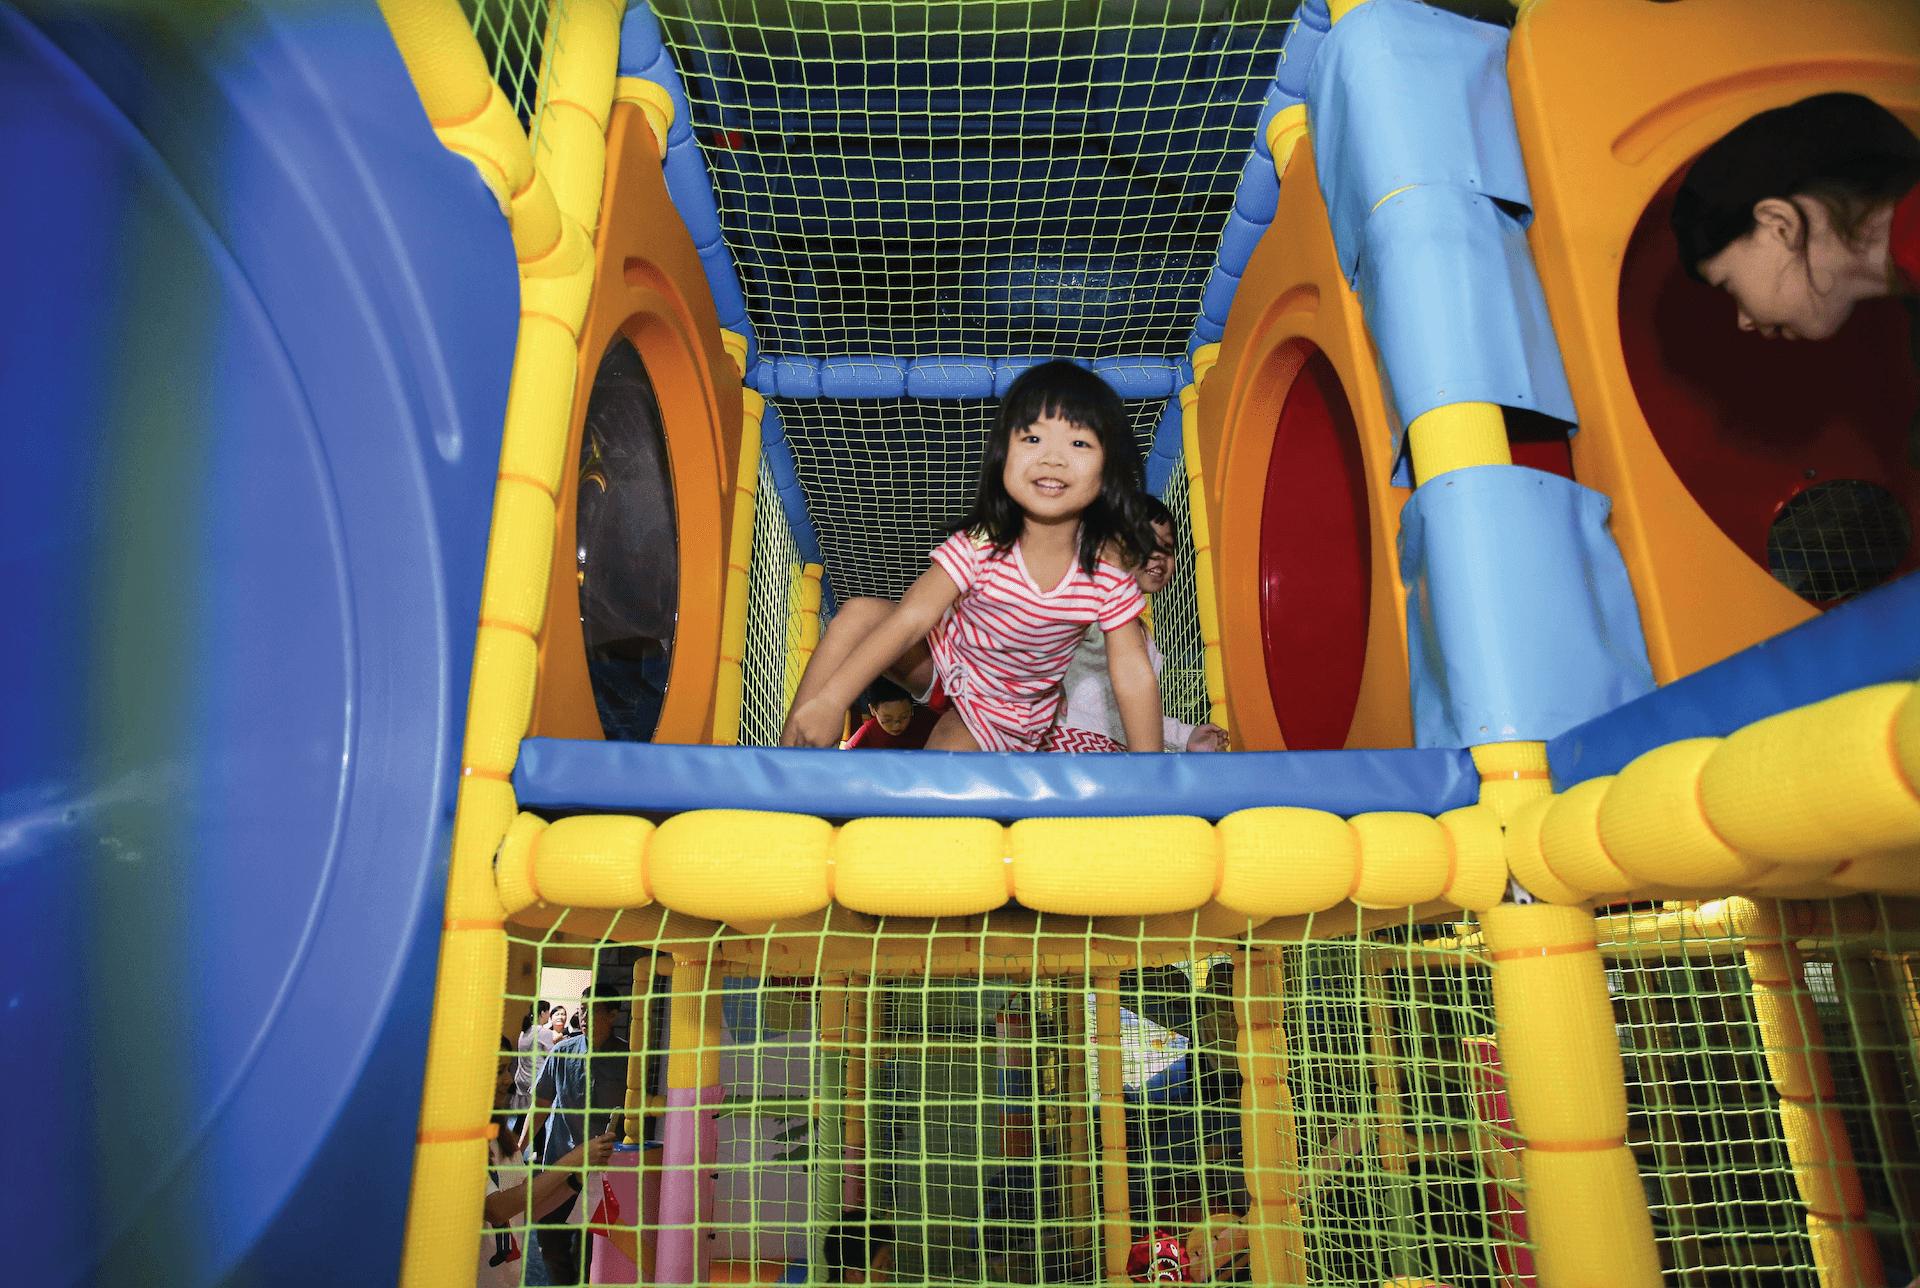 Poby's Jungle Gym Playground